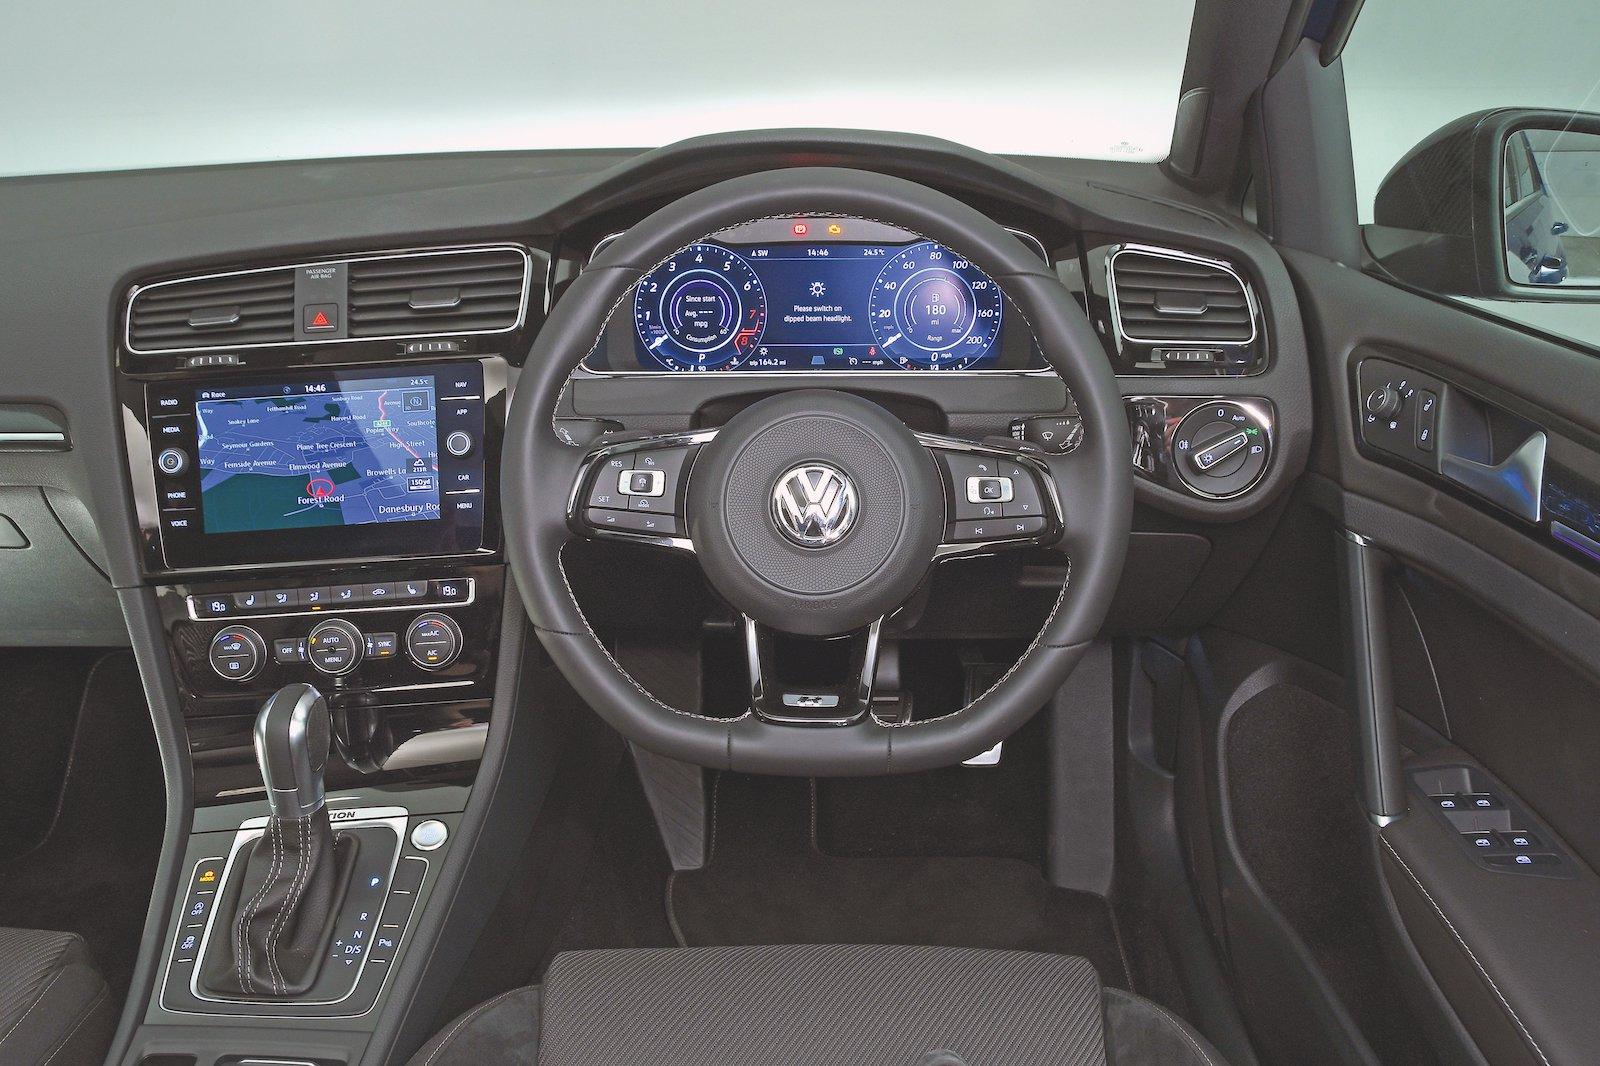 Used Volkswagen Golf R 2016-present